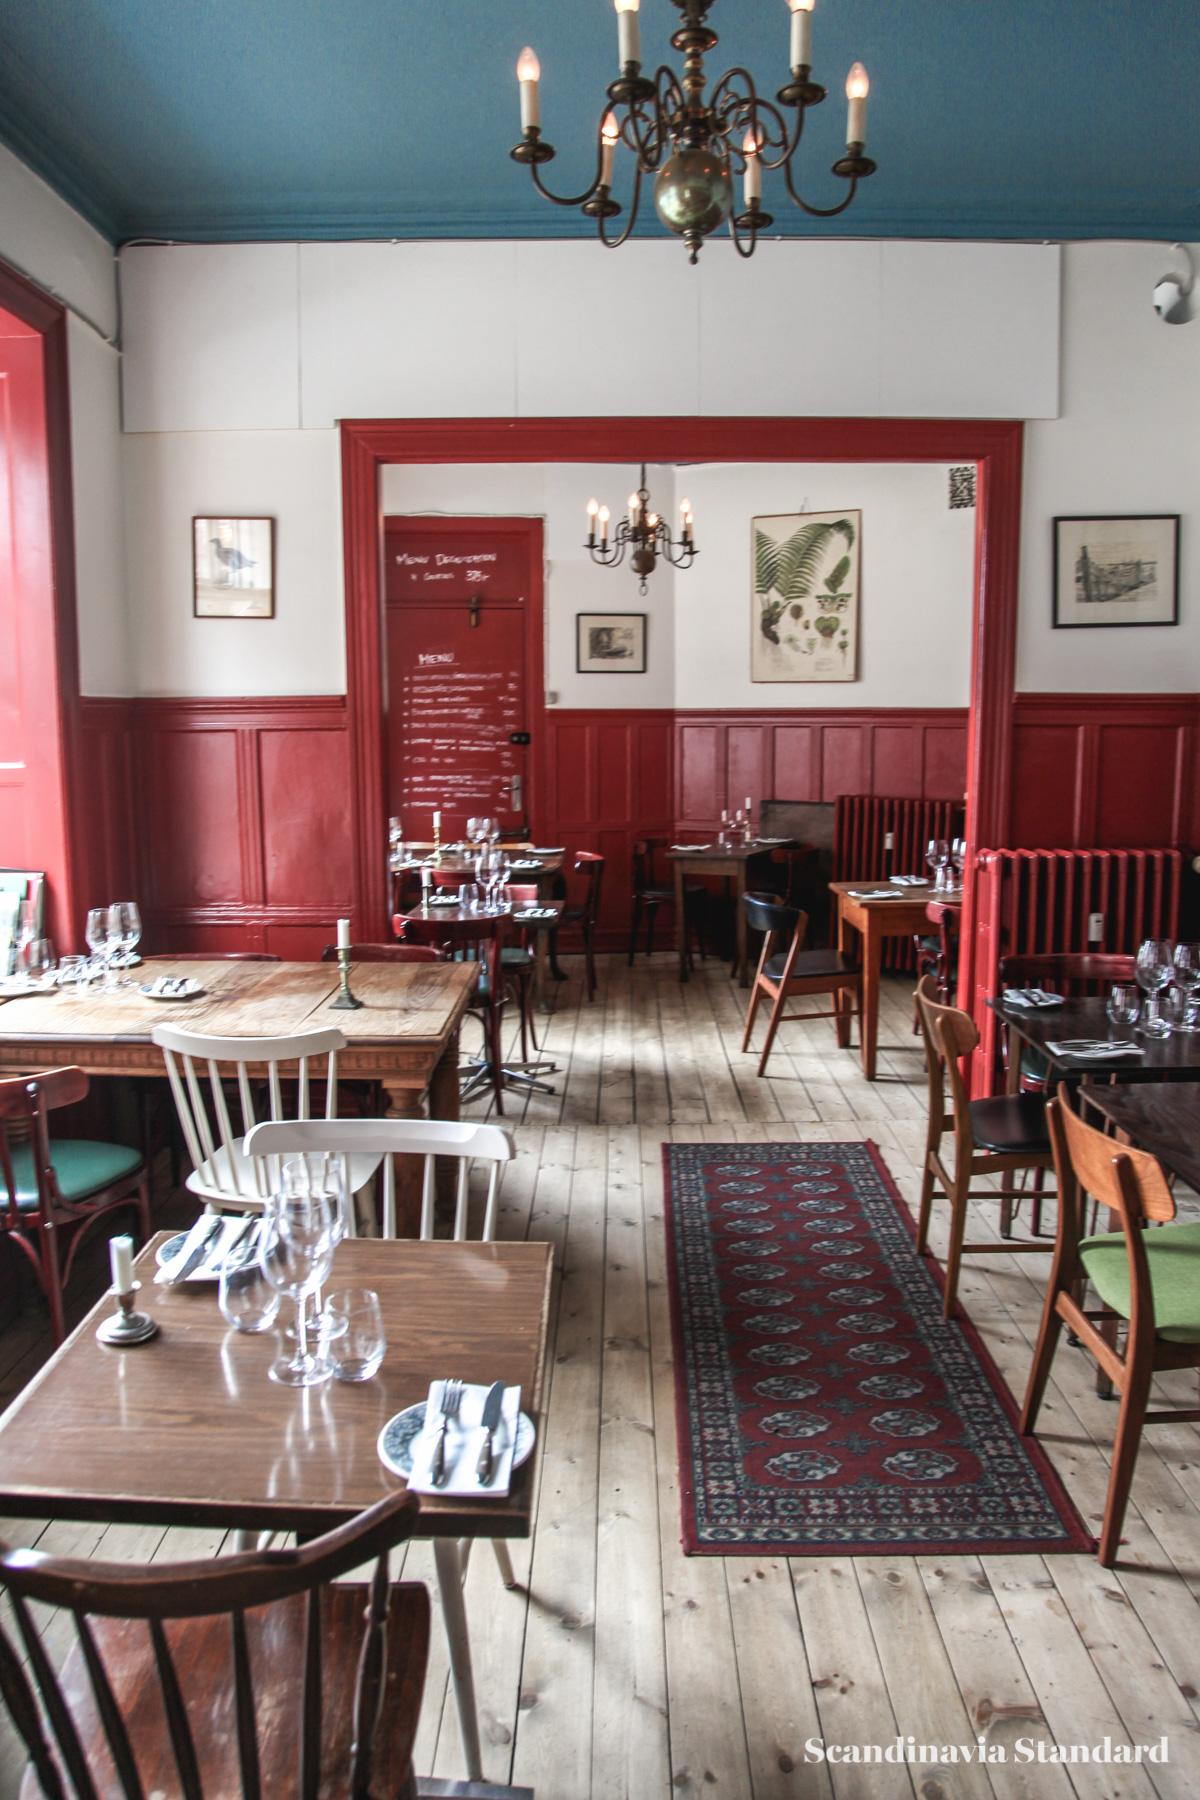 'Je t'aime' French Restaurant with New Nordic Influences in Copenhagen   Scandinavia Standard